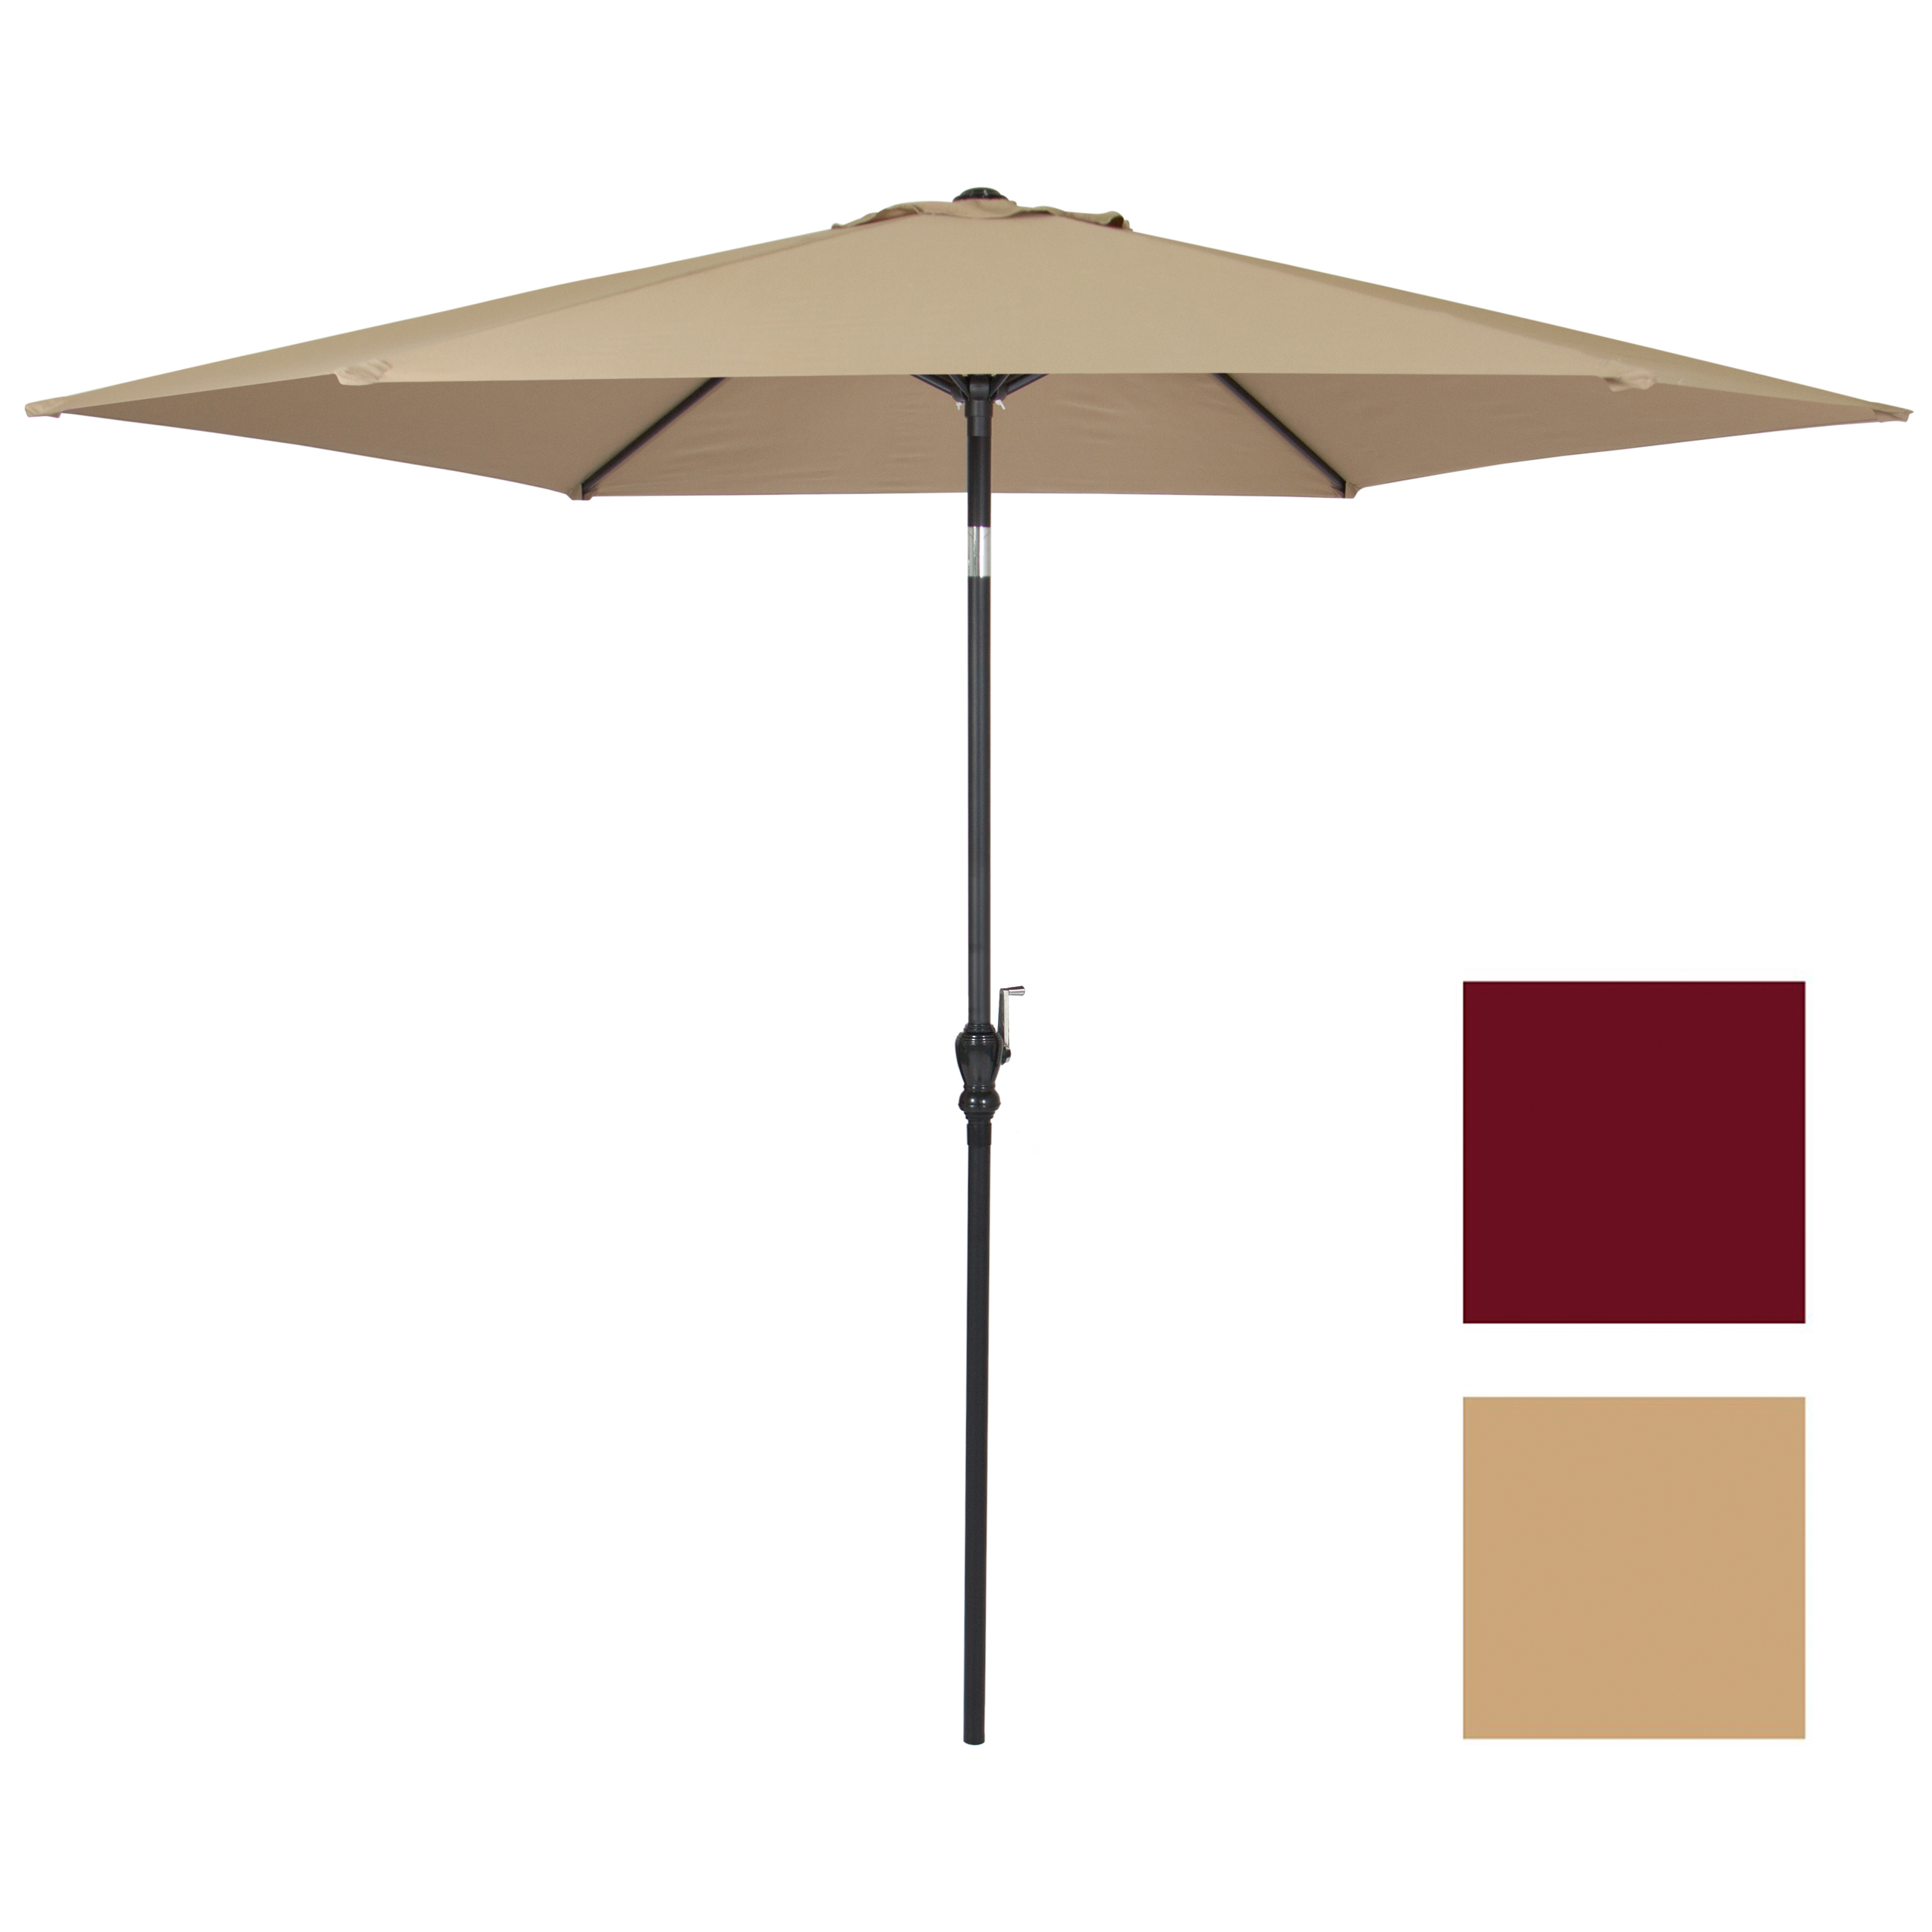 10 FT Steel Market Outdoor Patio Umbrella W  Crank, Tilt Push Button by